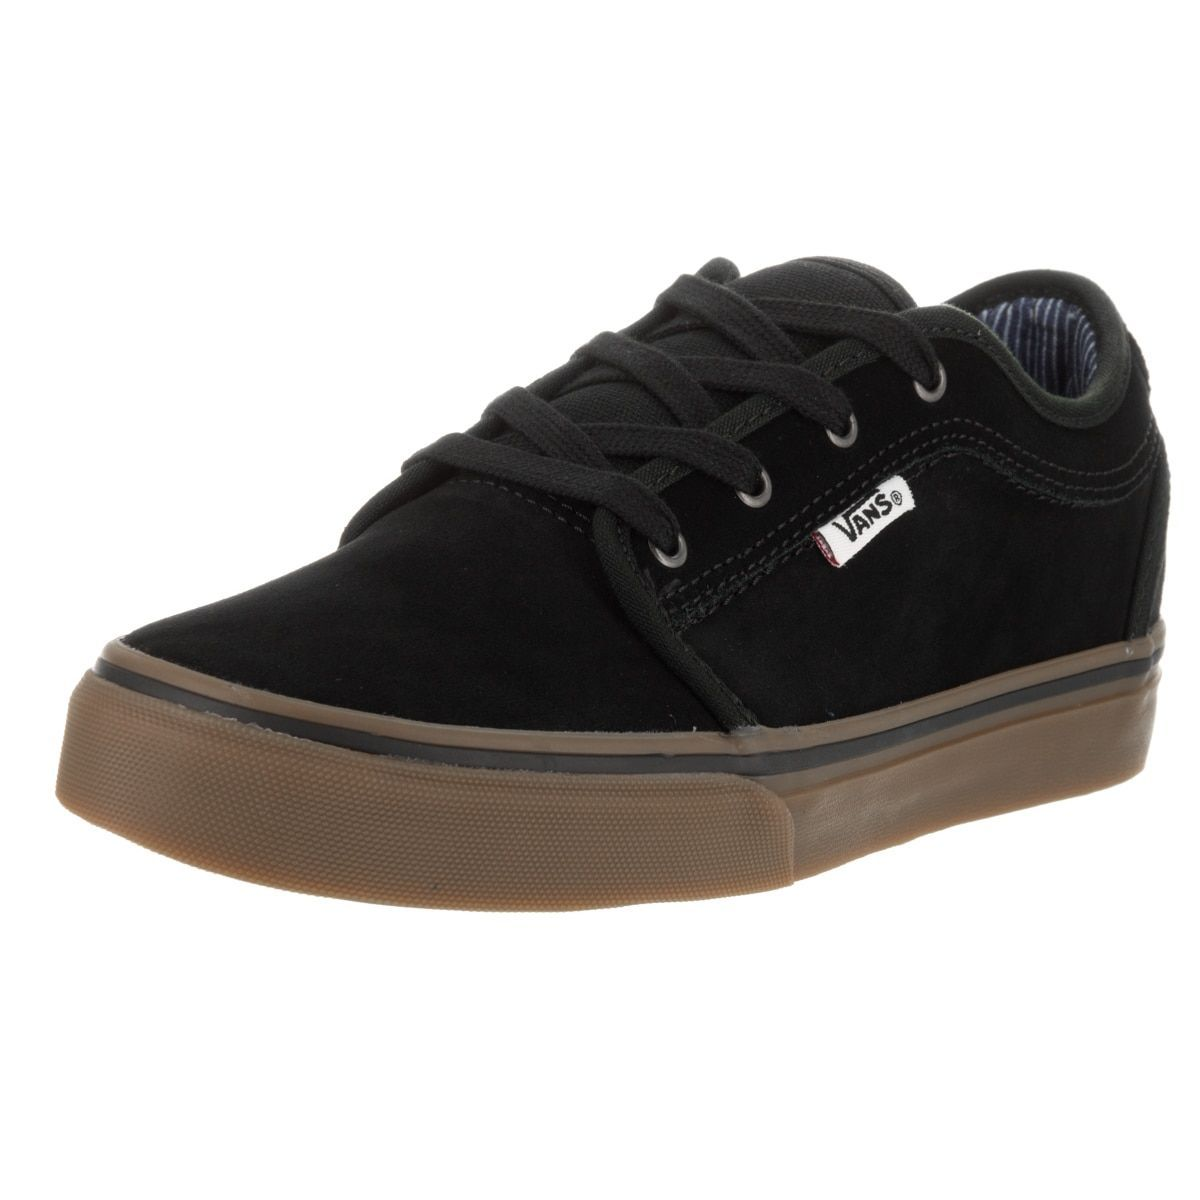 Skate shoes under 30 dollars - Vans Kids Chukka Low Work Wear Gum Skate Shoes